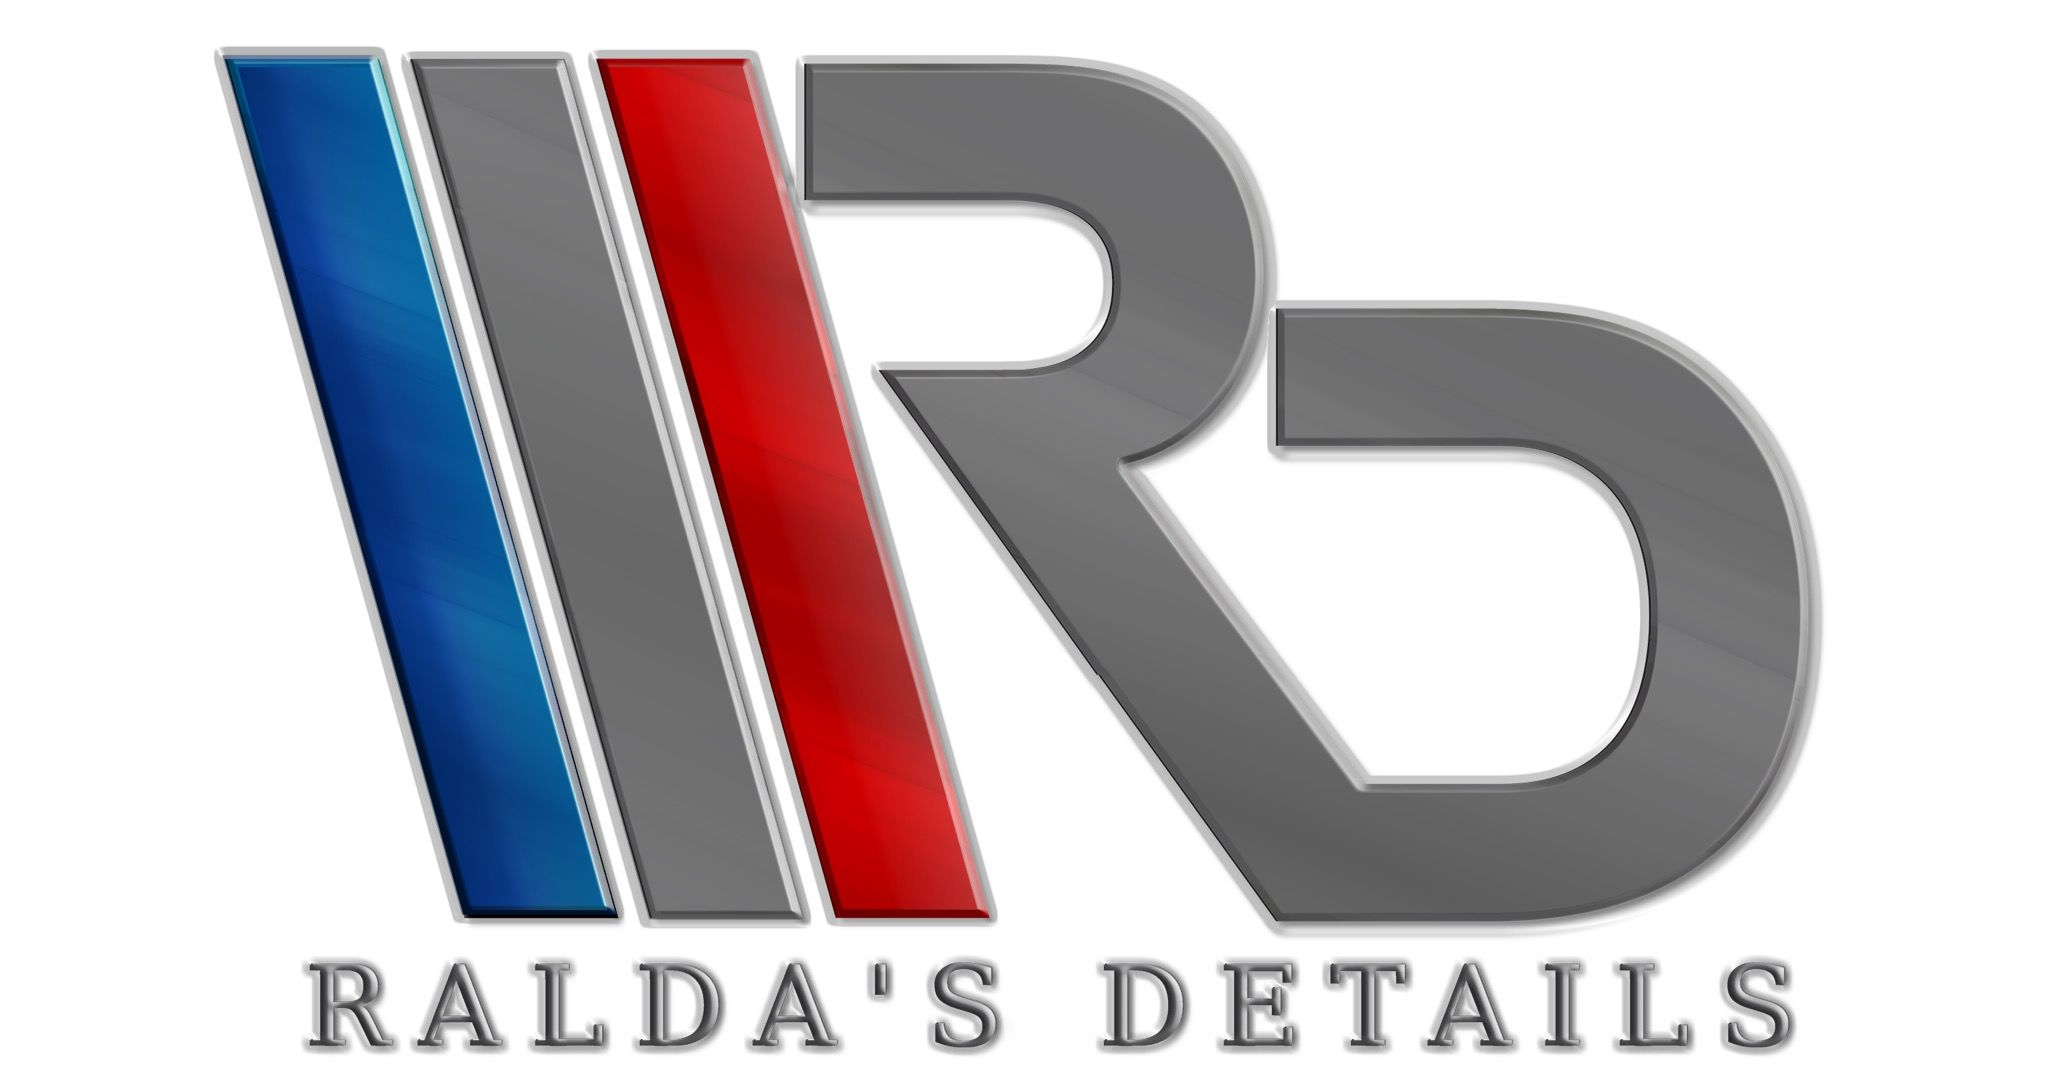 Ralda's Details Highlights the Benefits of Car Detailing in Richmond VA